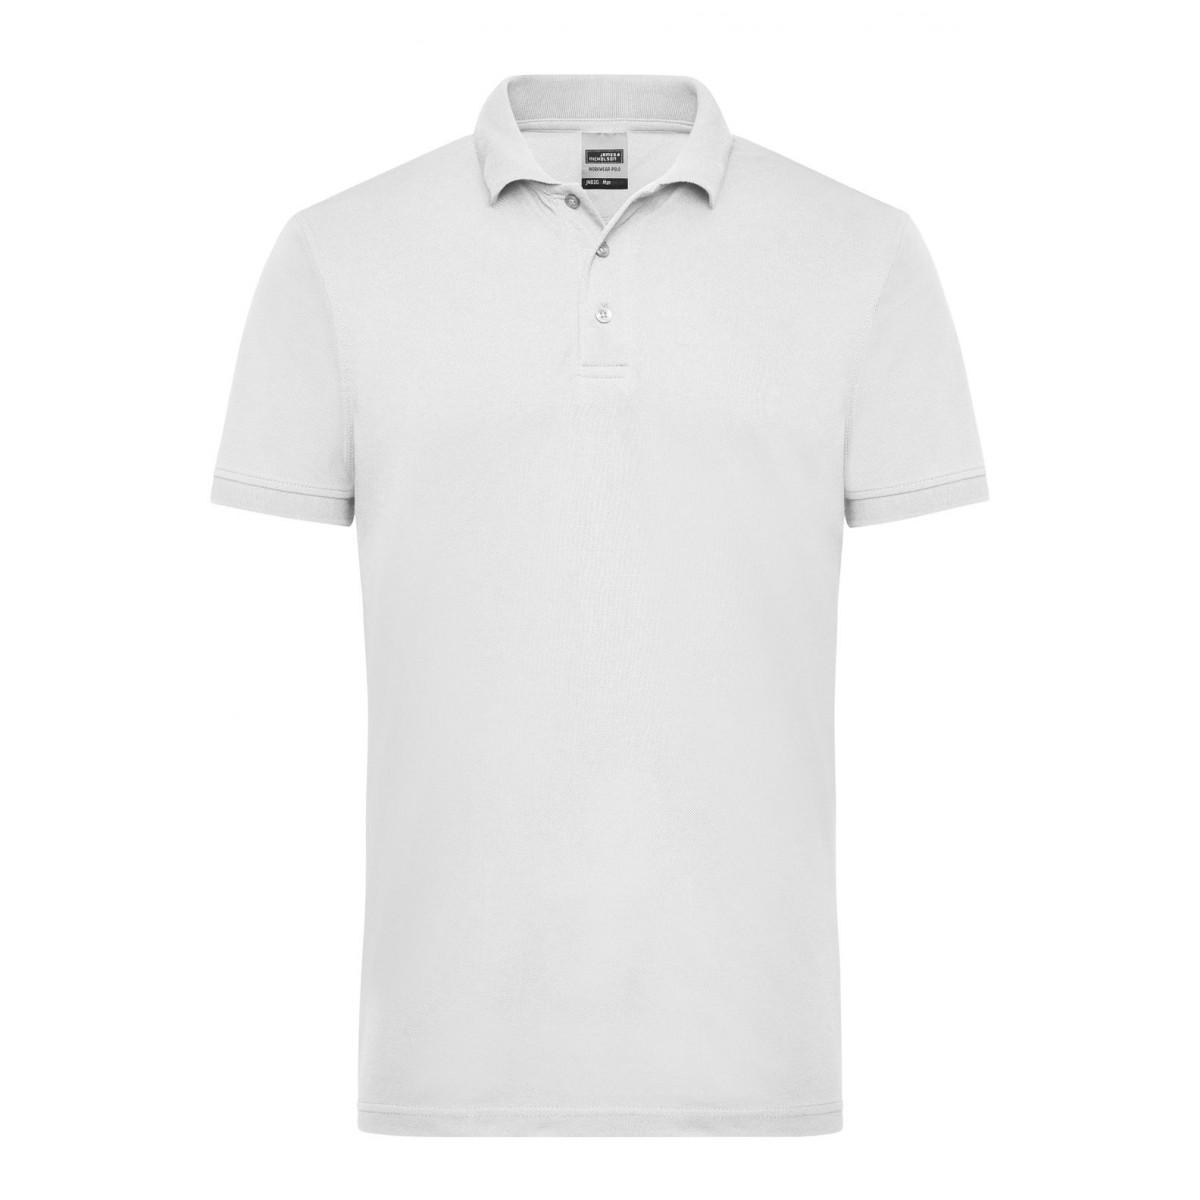 Рубашка поло мужская JN830 Mens Workwear Polo - Белый